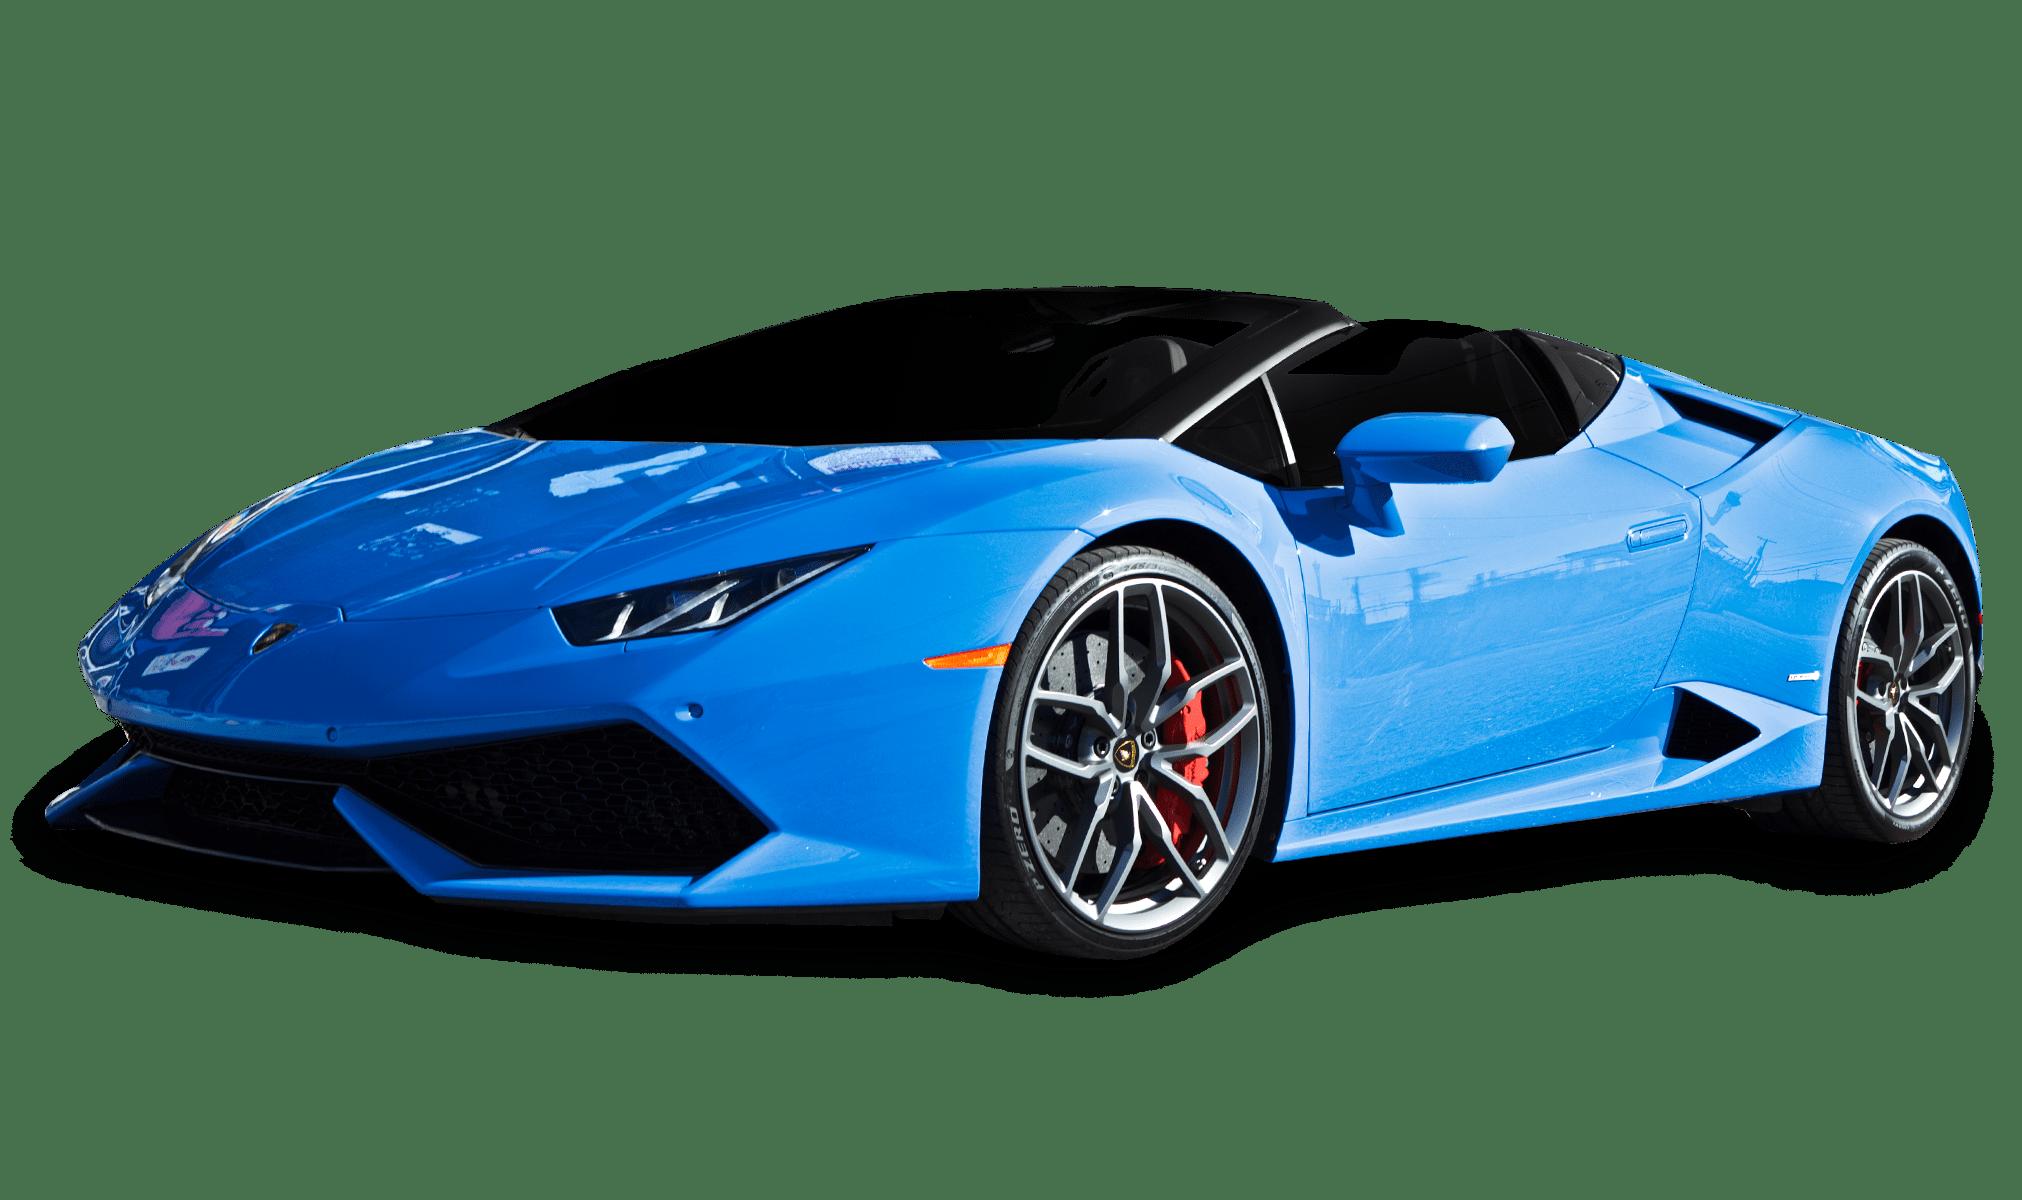 Las Vegas Supercar Rental >> Lamborghini Huracán Convertible - #1 Exotic Car Rentals